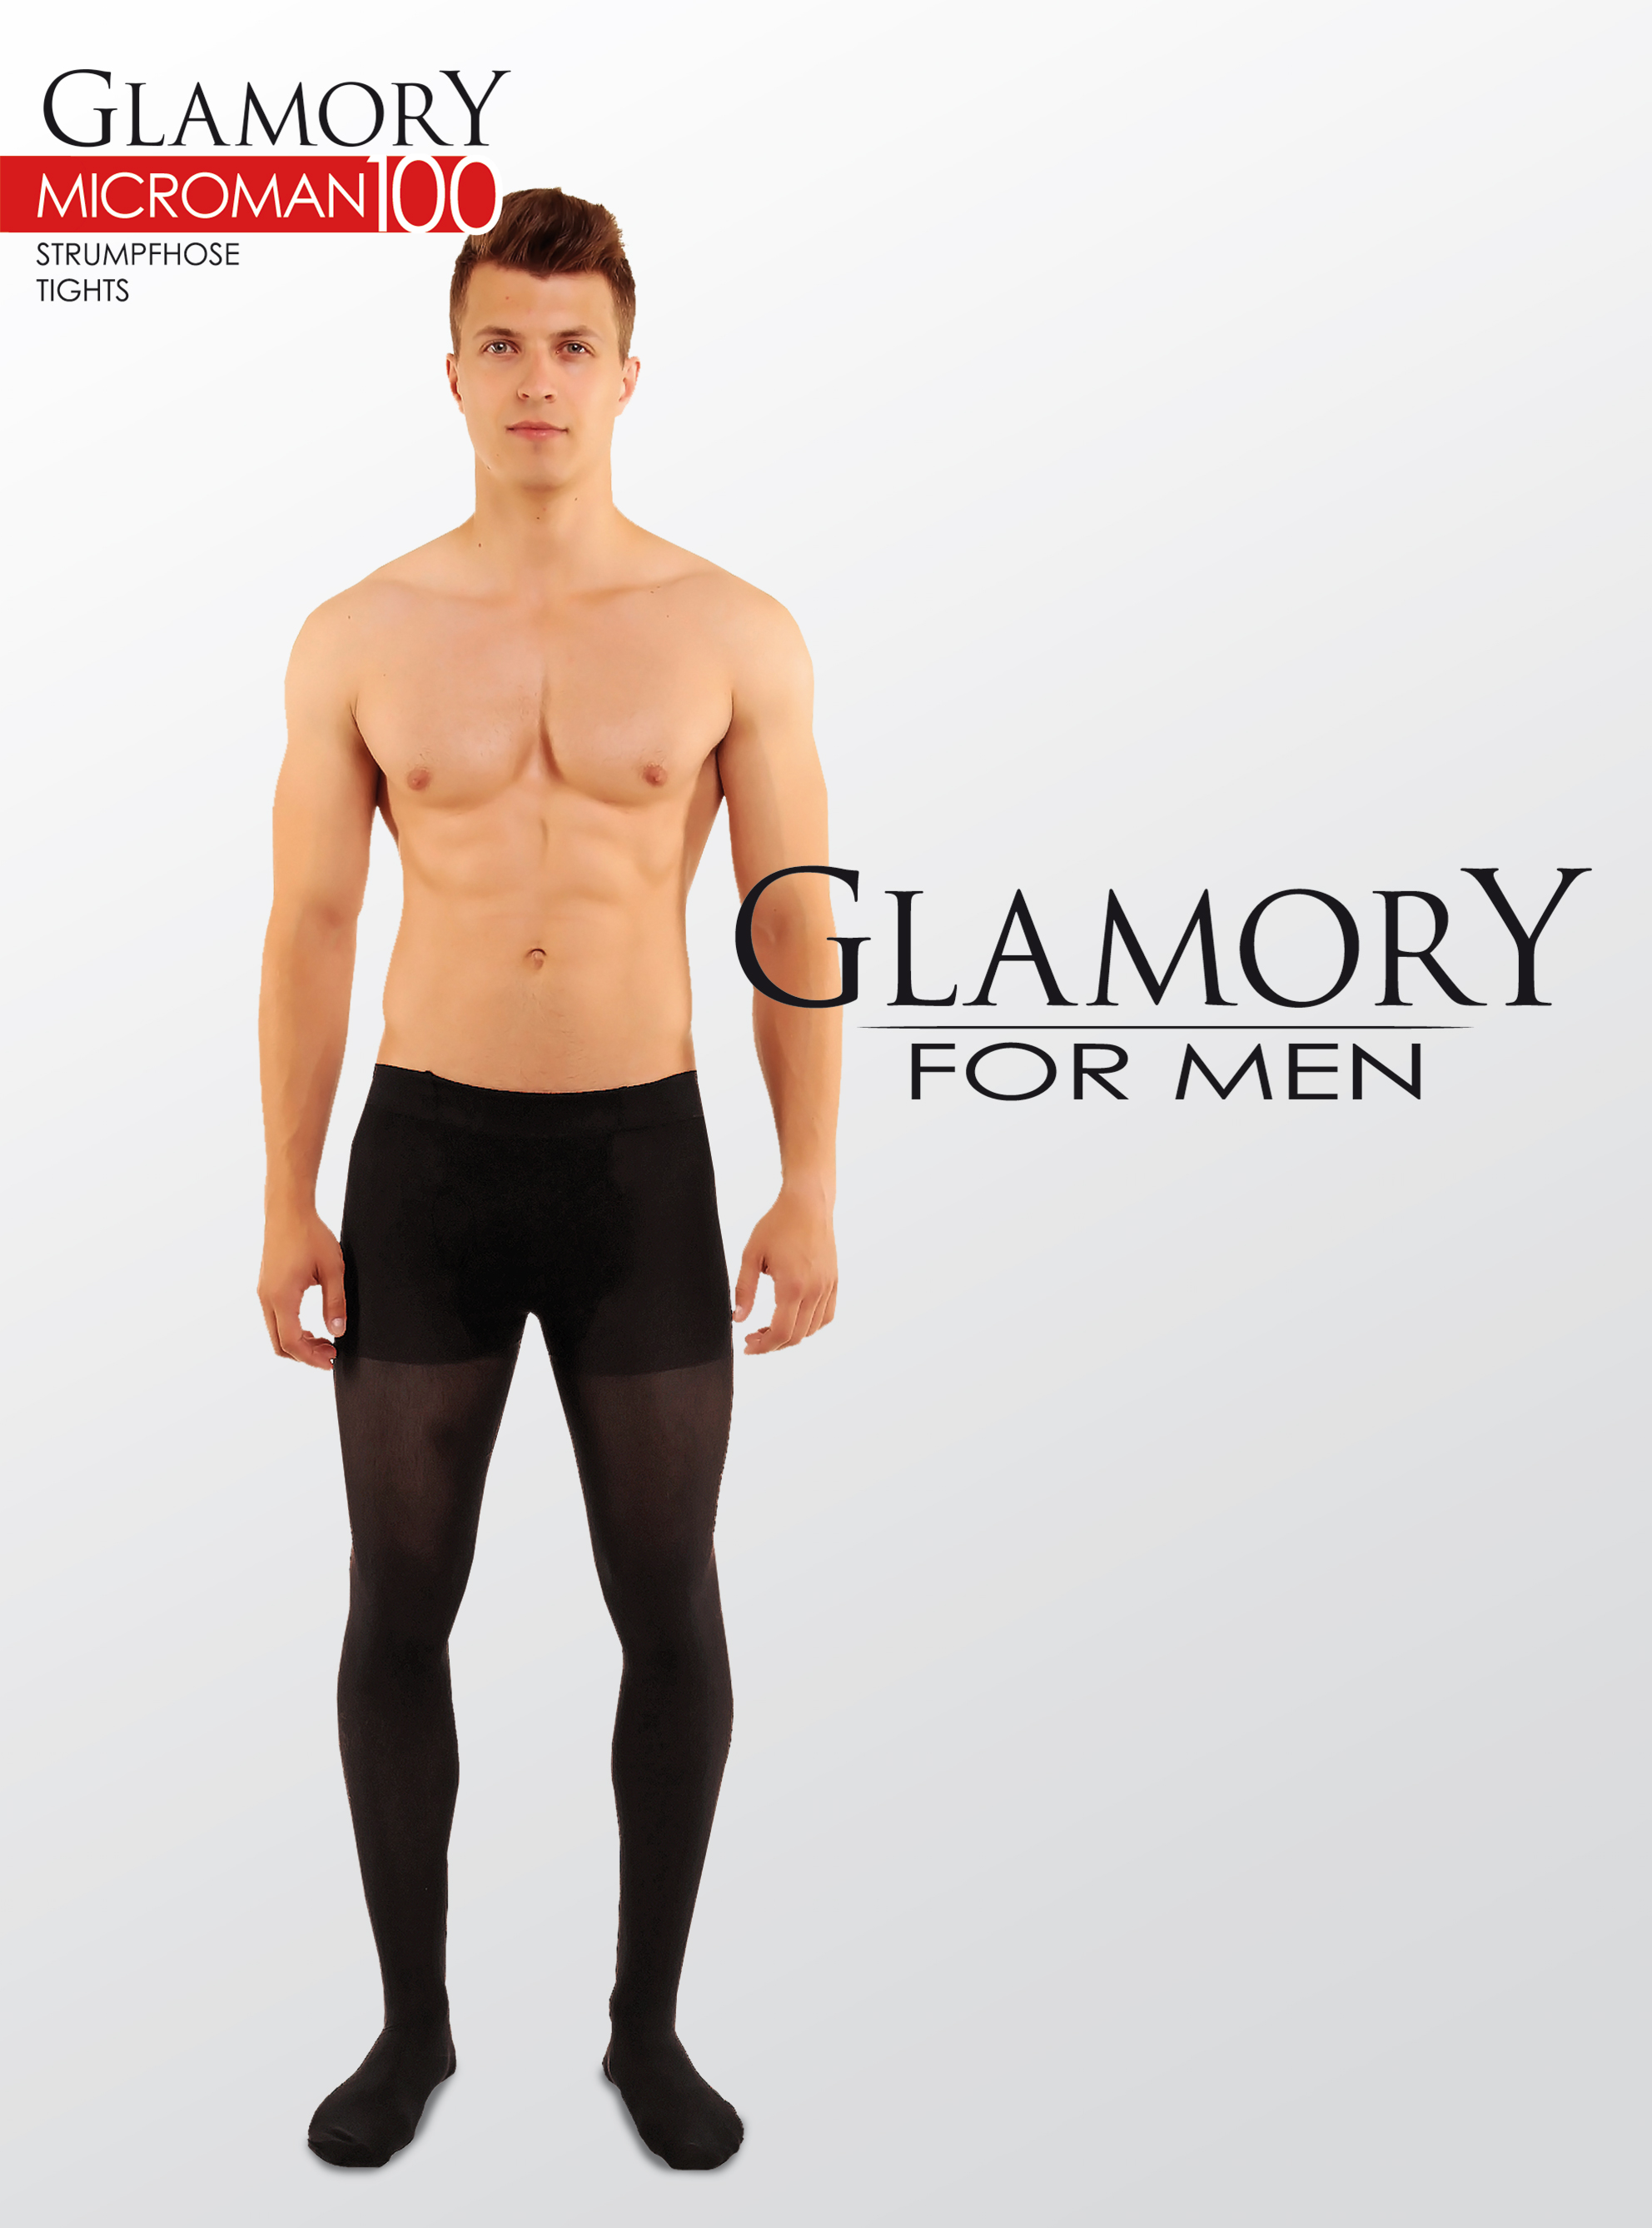 Strumpbyxor för män | strumpbyx-boutique.se